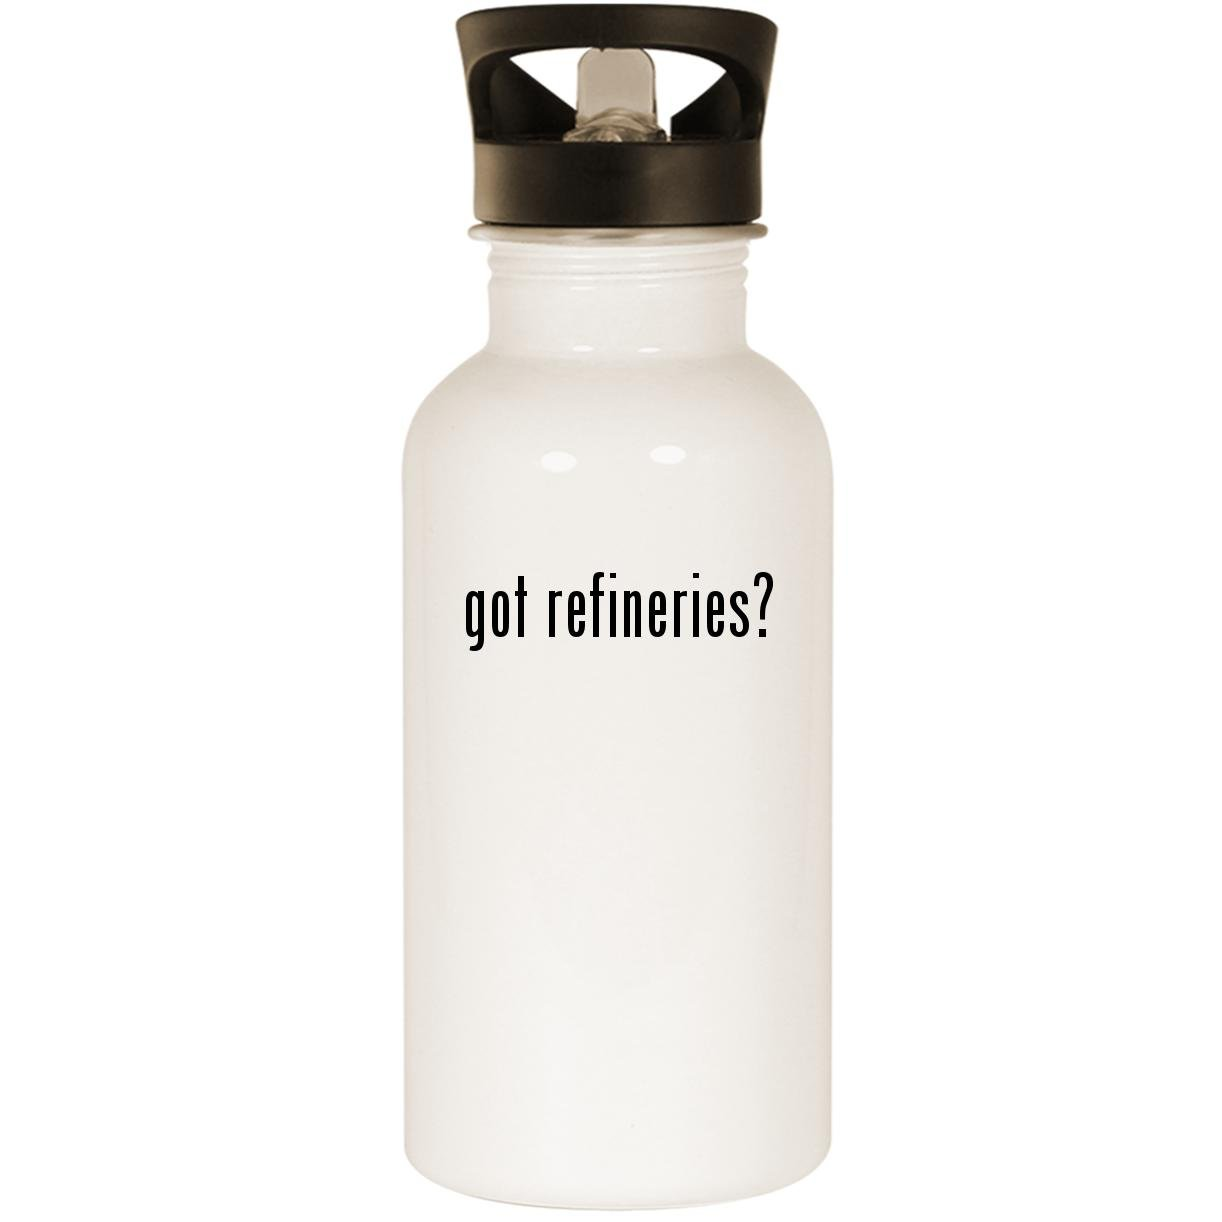 Got Refineries  – ステンレススチール20oz Road Ready水ボトル ホワイト US-C-07-18-01-047813-04-26-19-26 B07FMMNCLC ホワイト